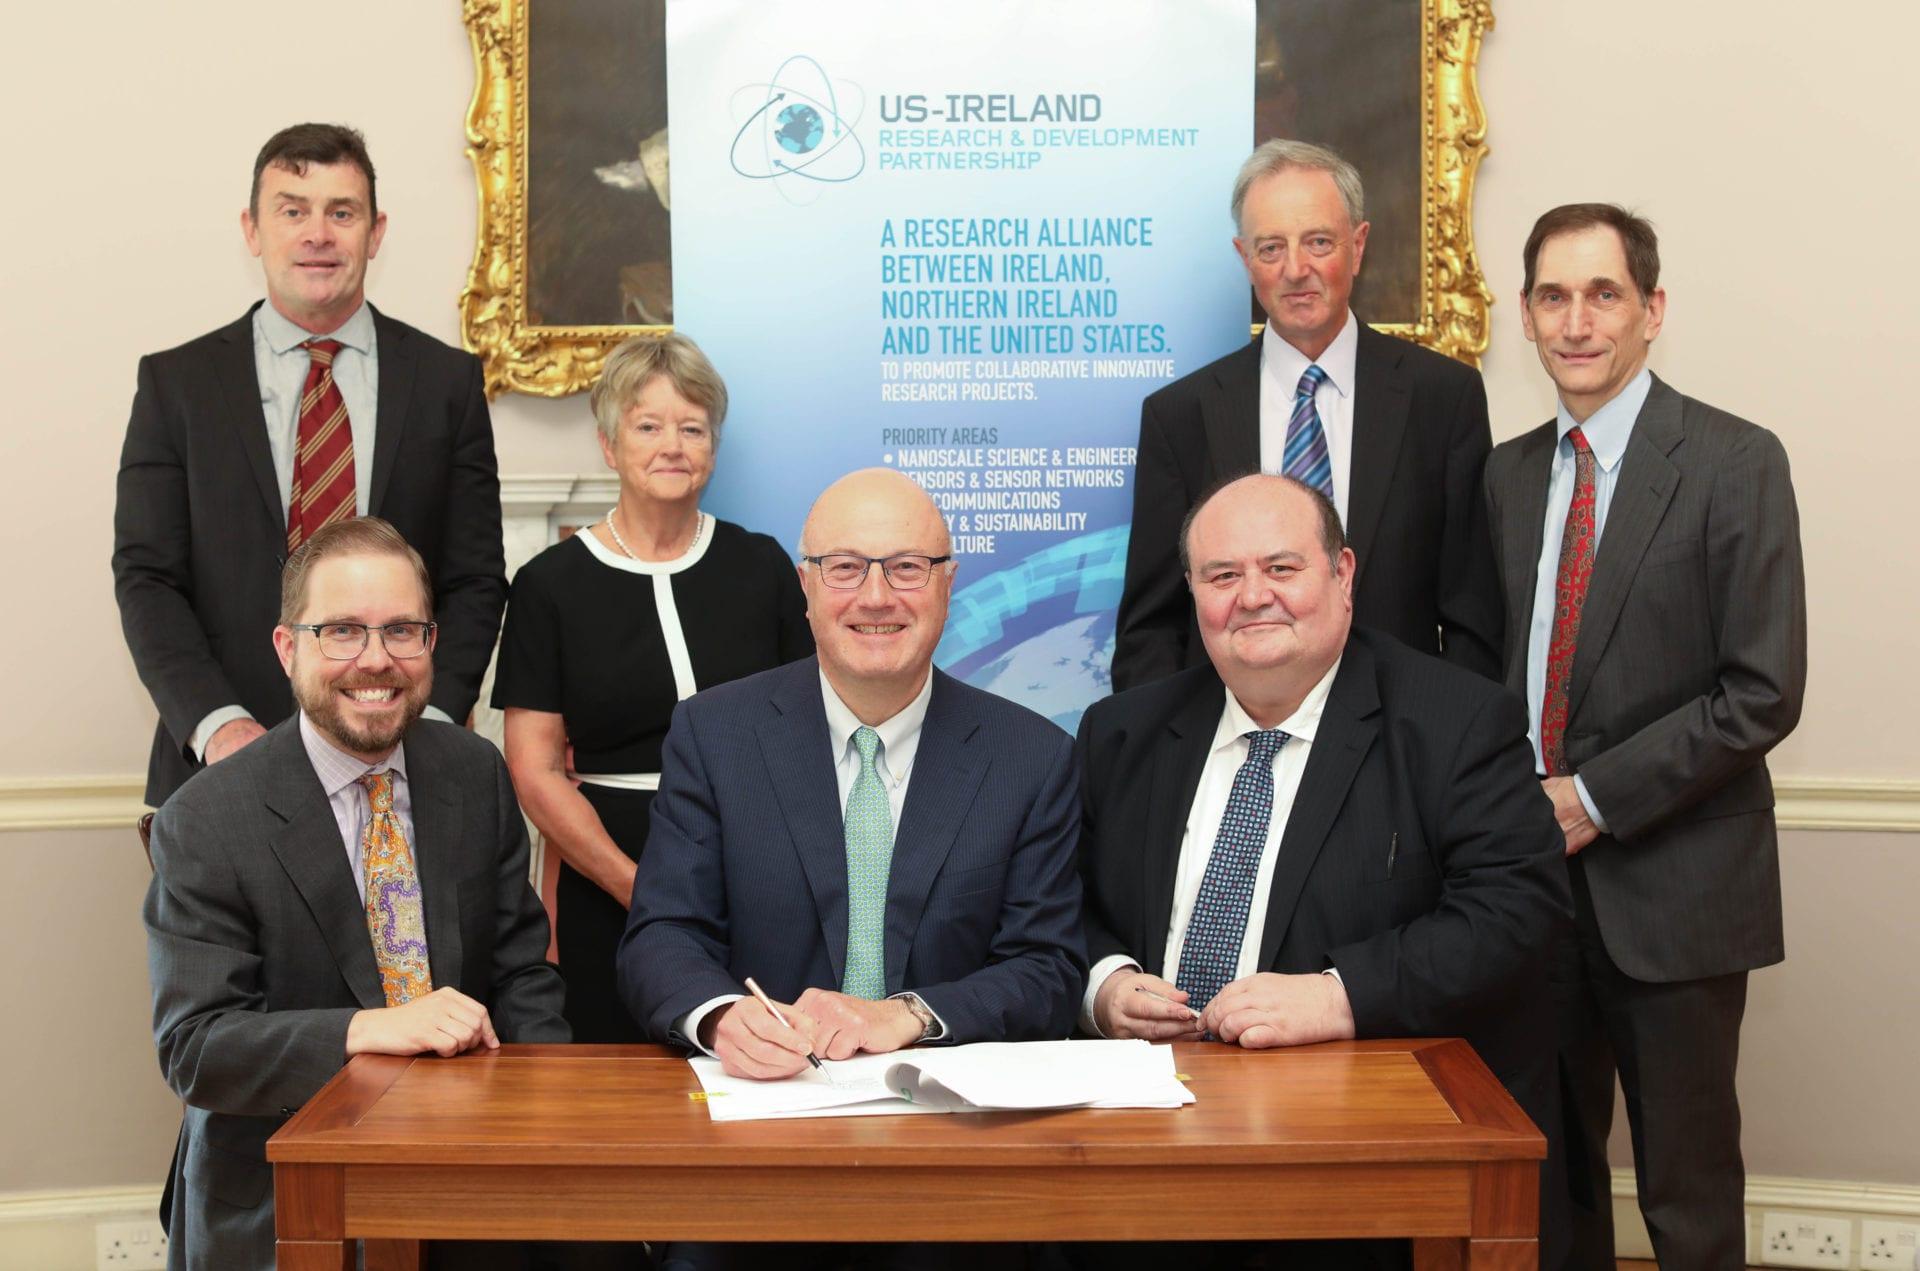 US-Ireland R&D partnership